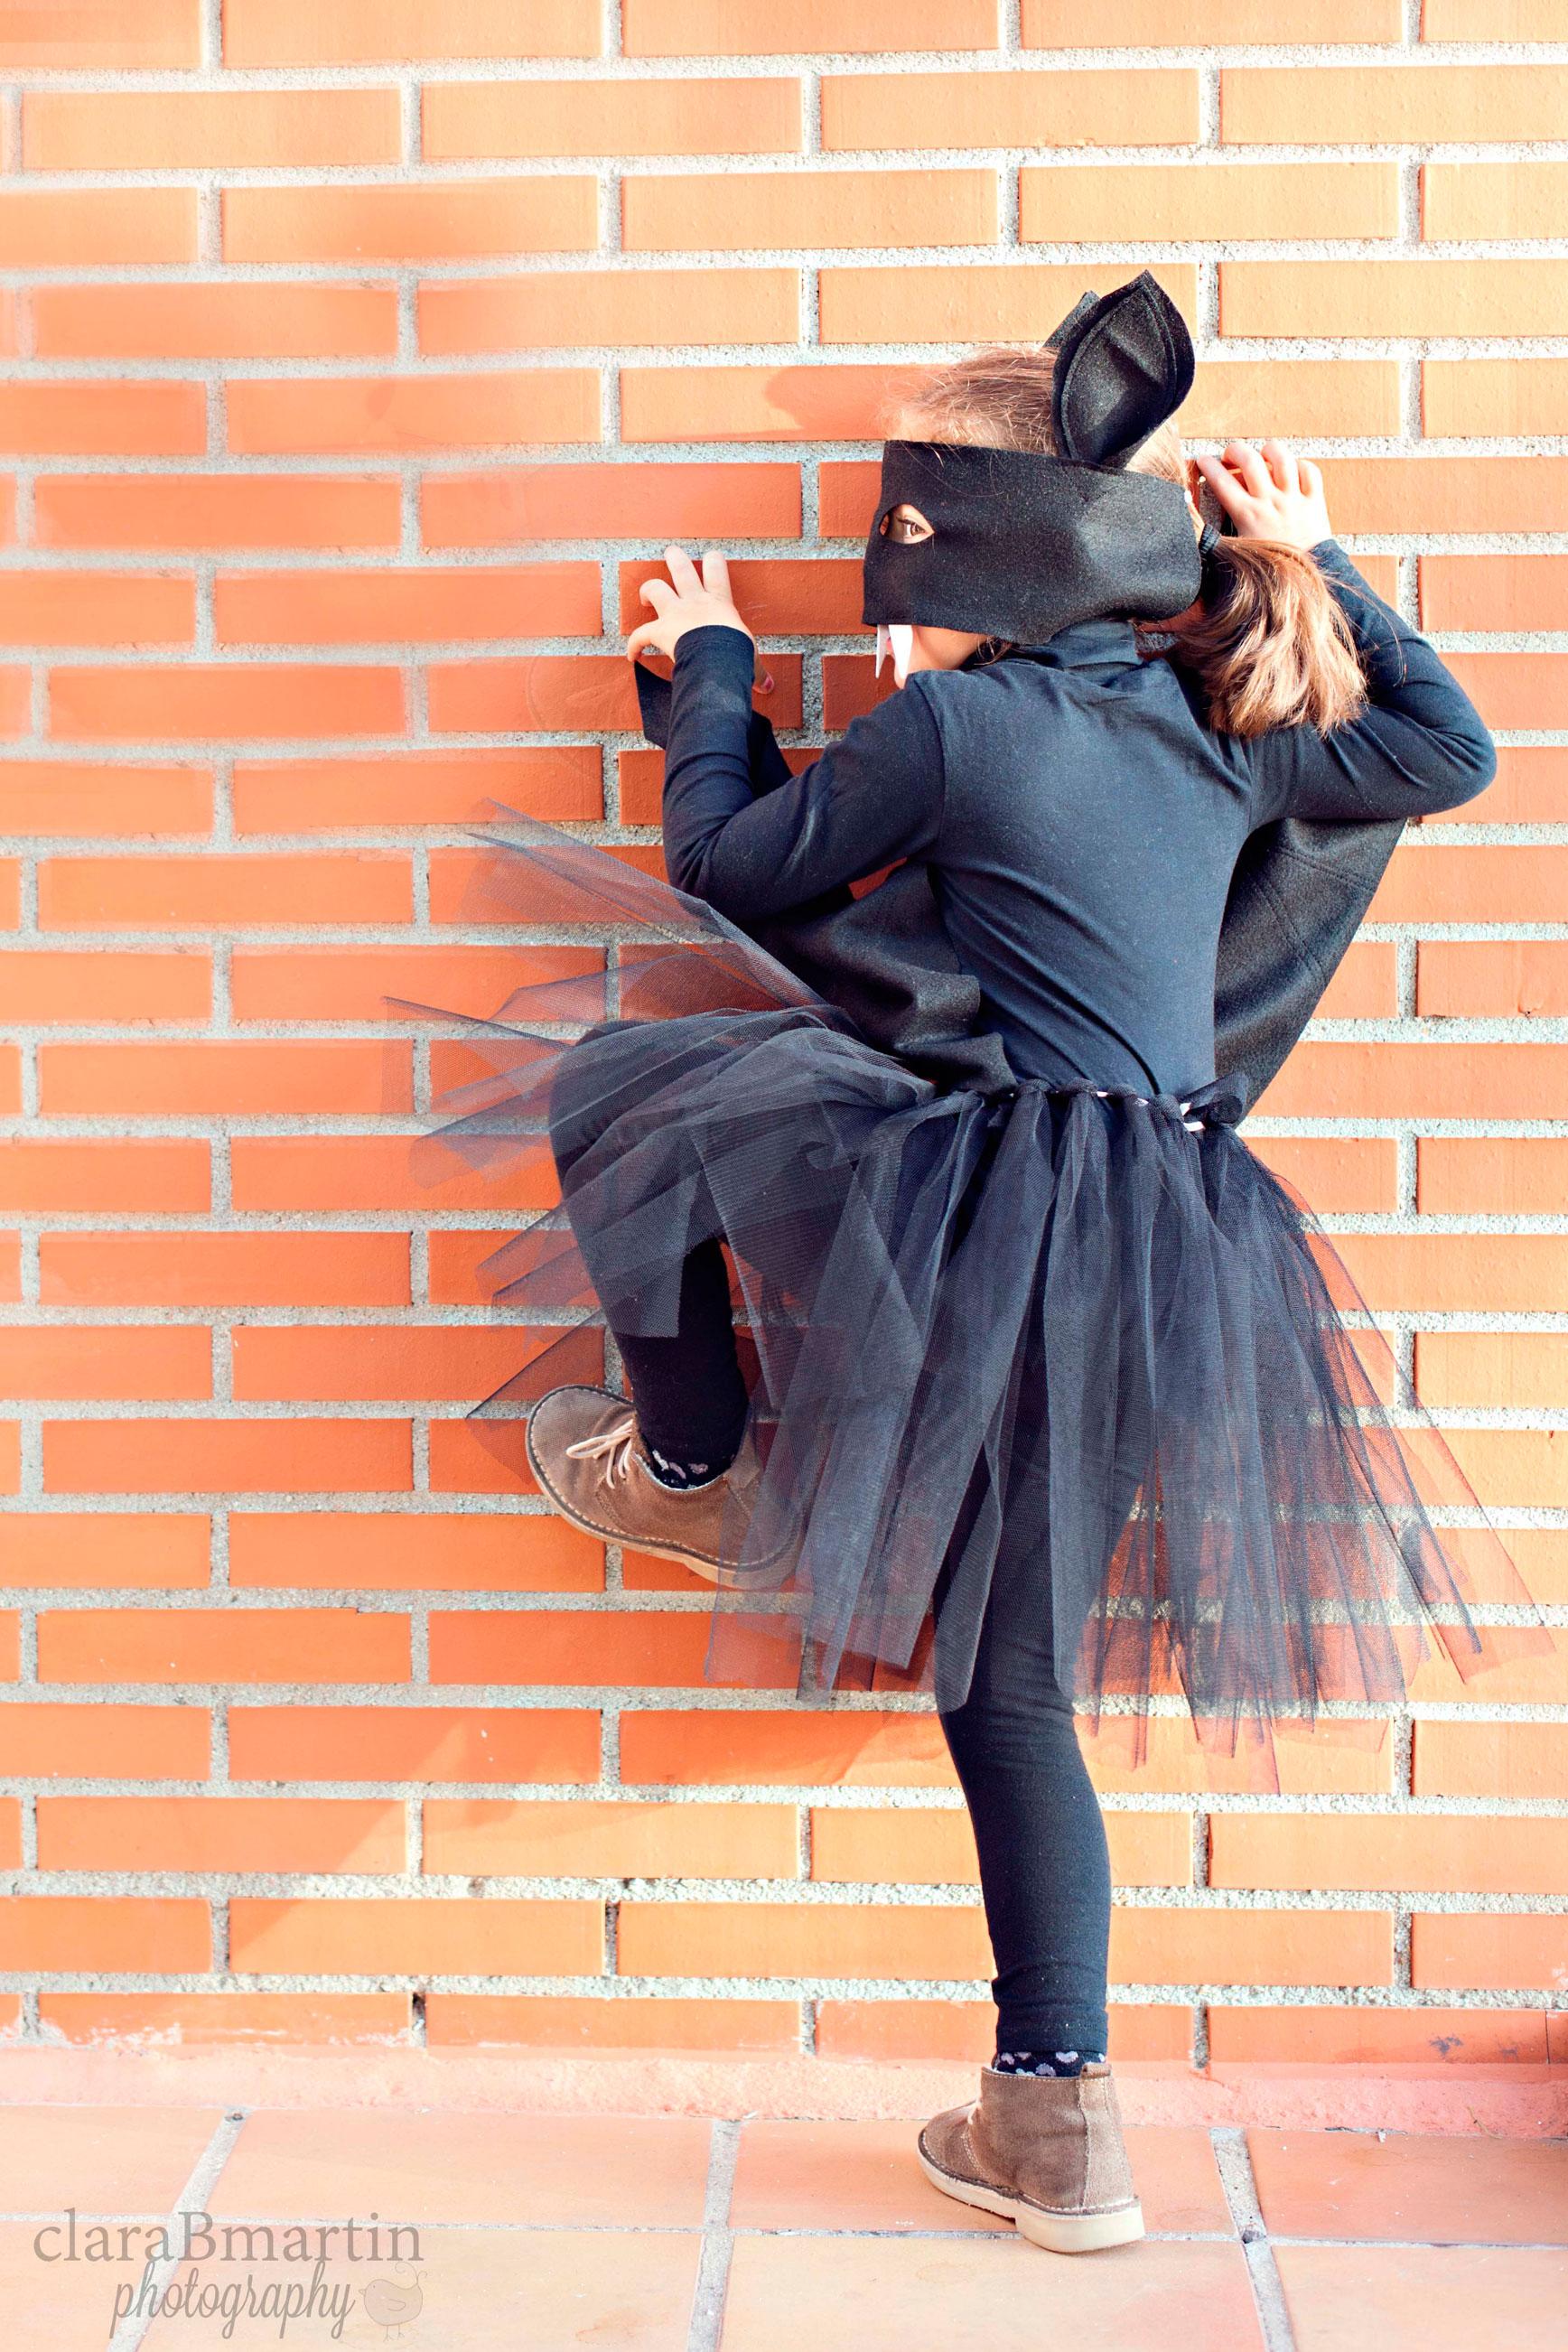 Disfraz Murcielago_claraBmartin11